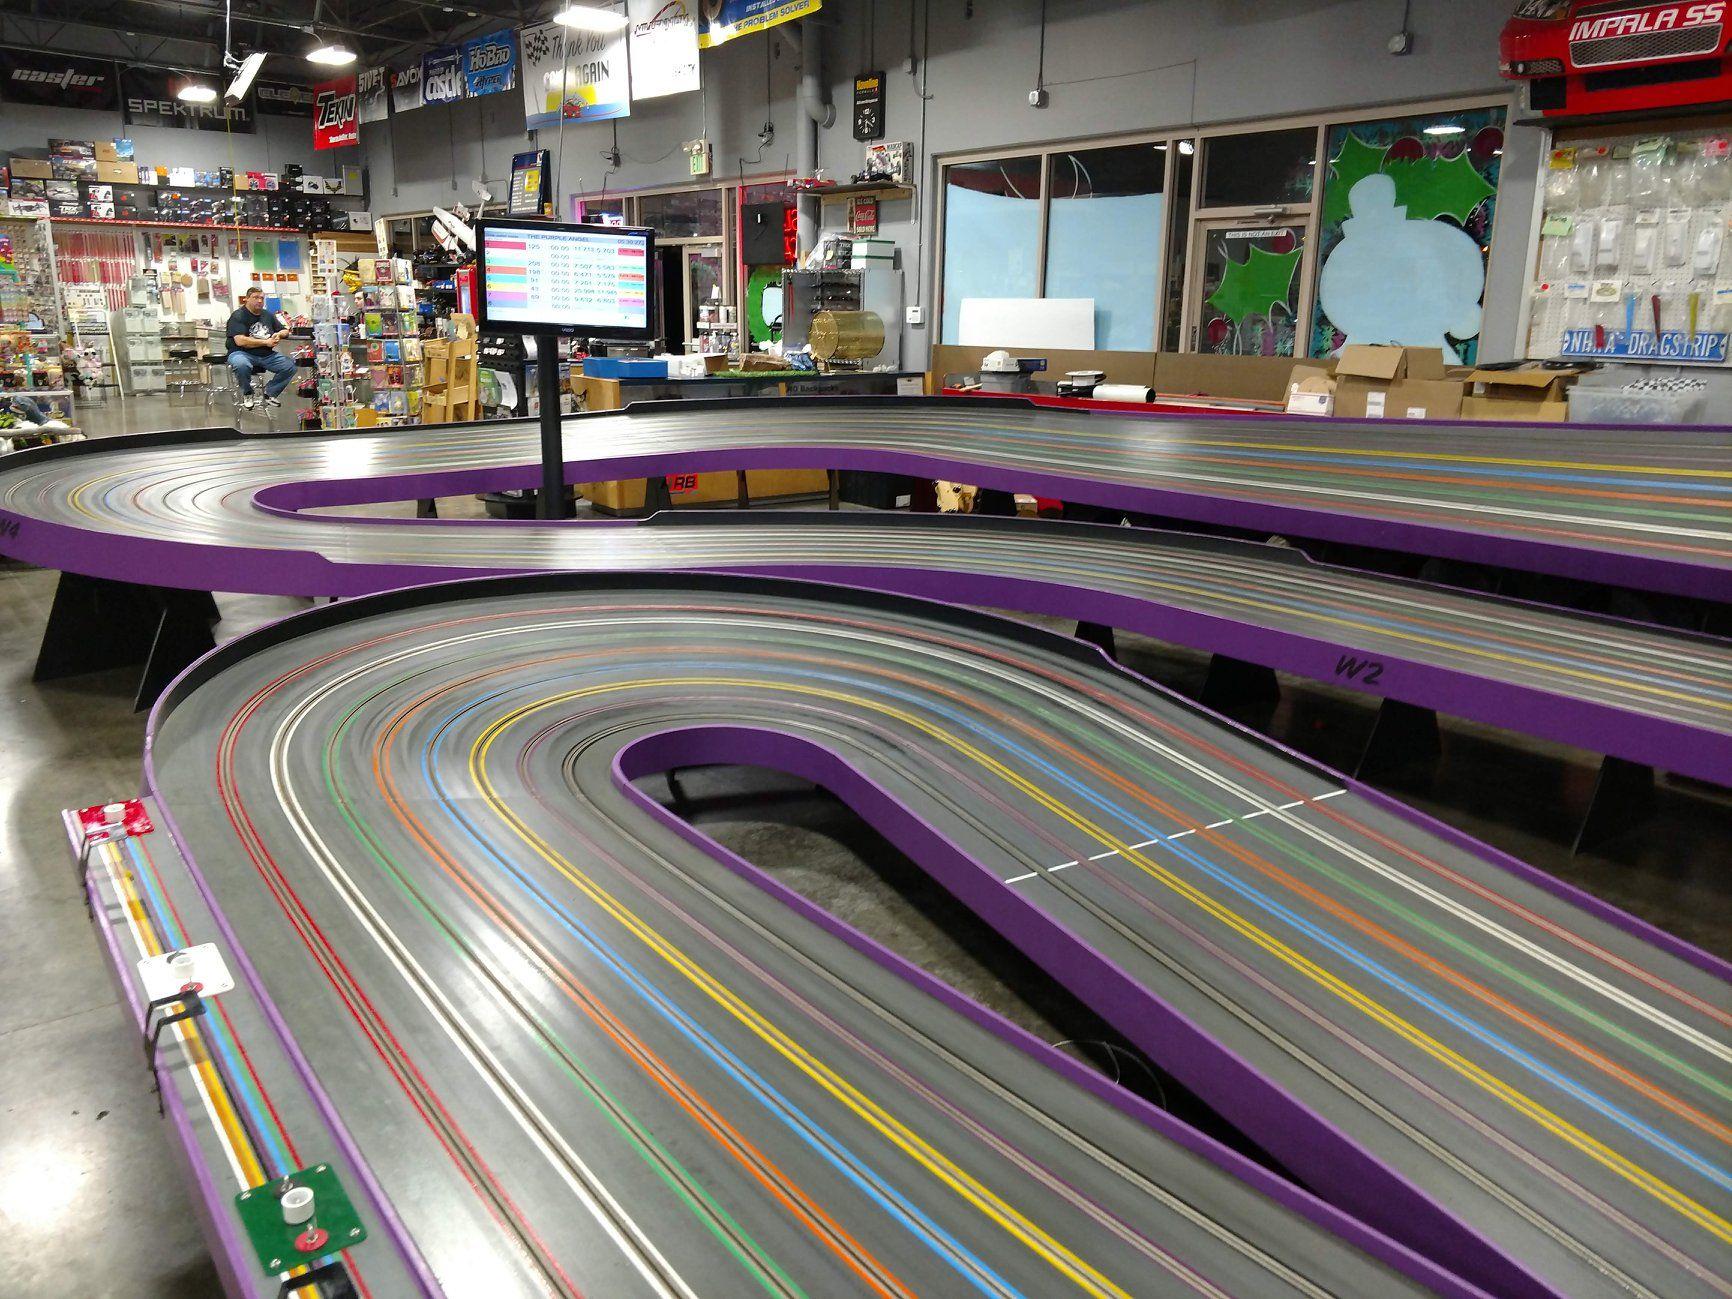 The Purple Angel Fast Track Hobbies Slot Car Tracks Slot Cars Car Model